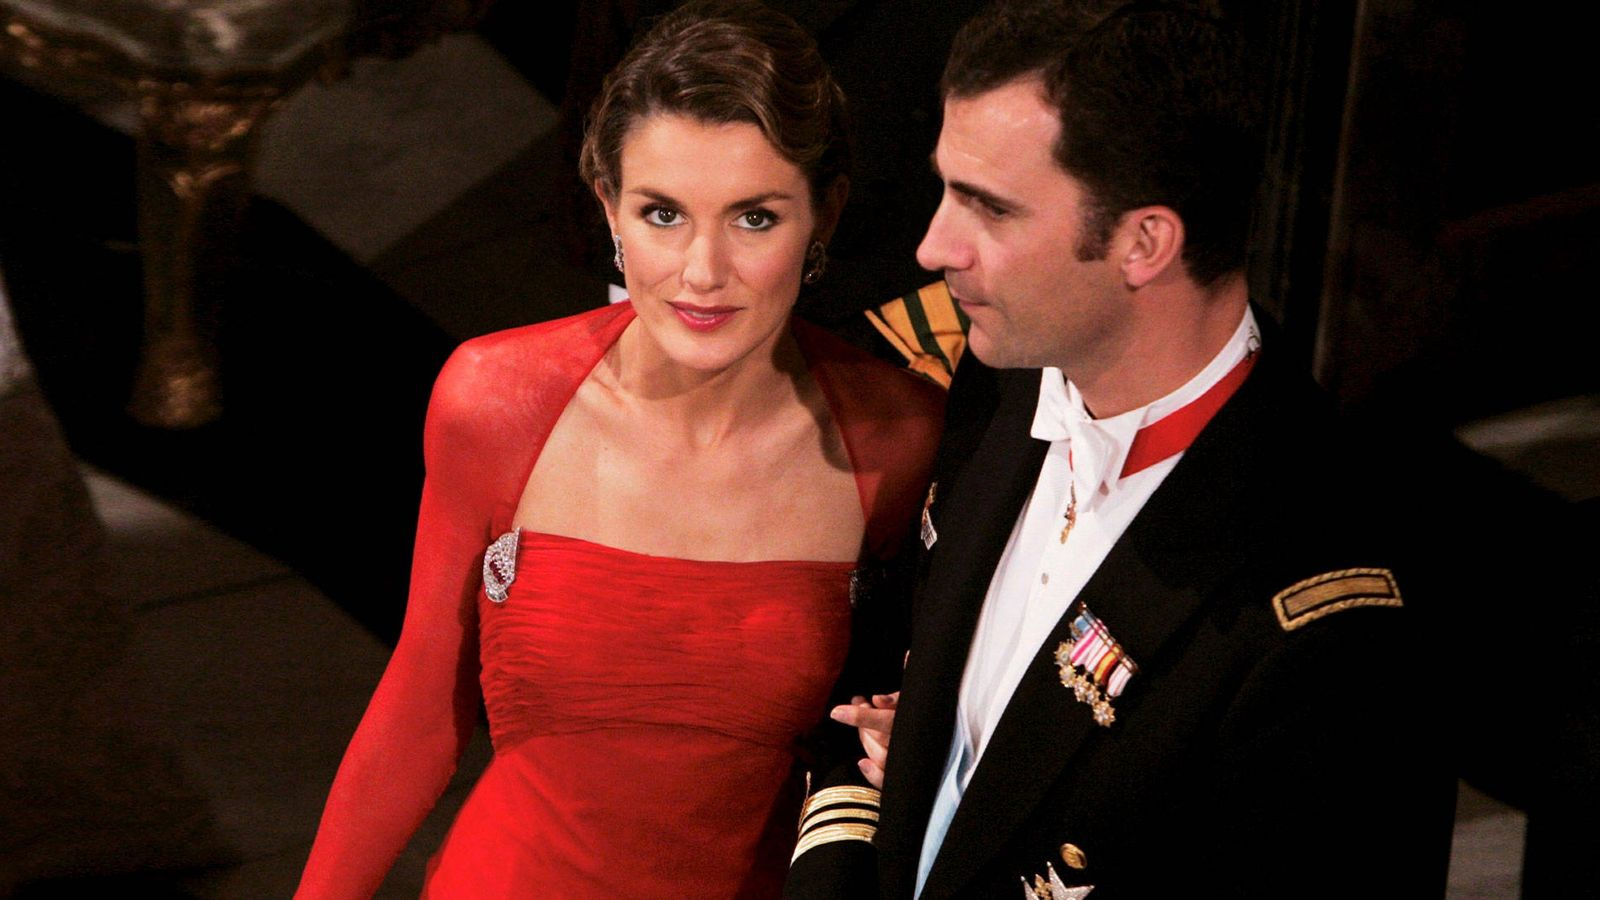 Foto: La reina Letizia y don Felipe, en la boda de Federico de Dinamarca. (Getty)